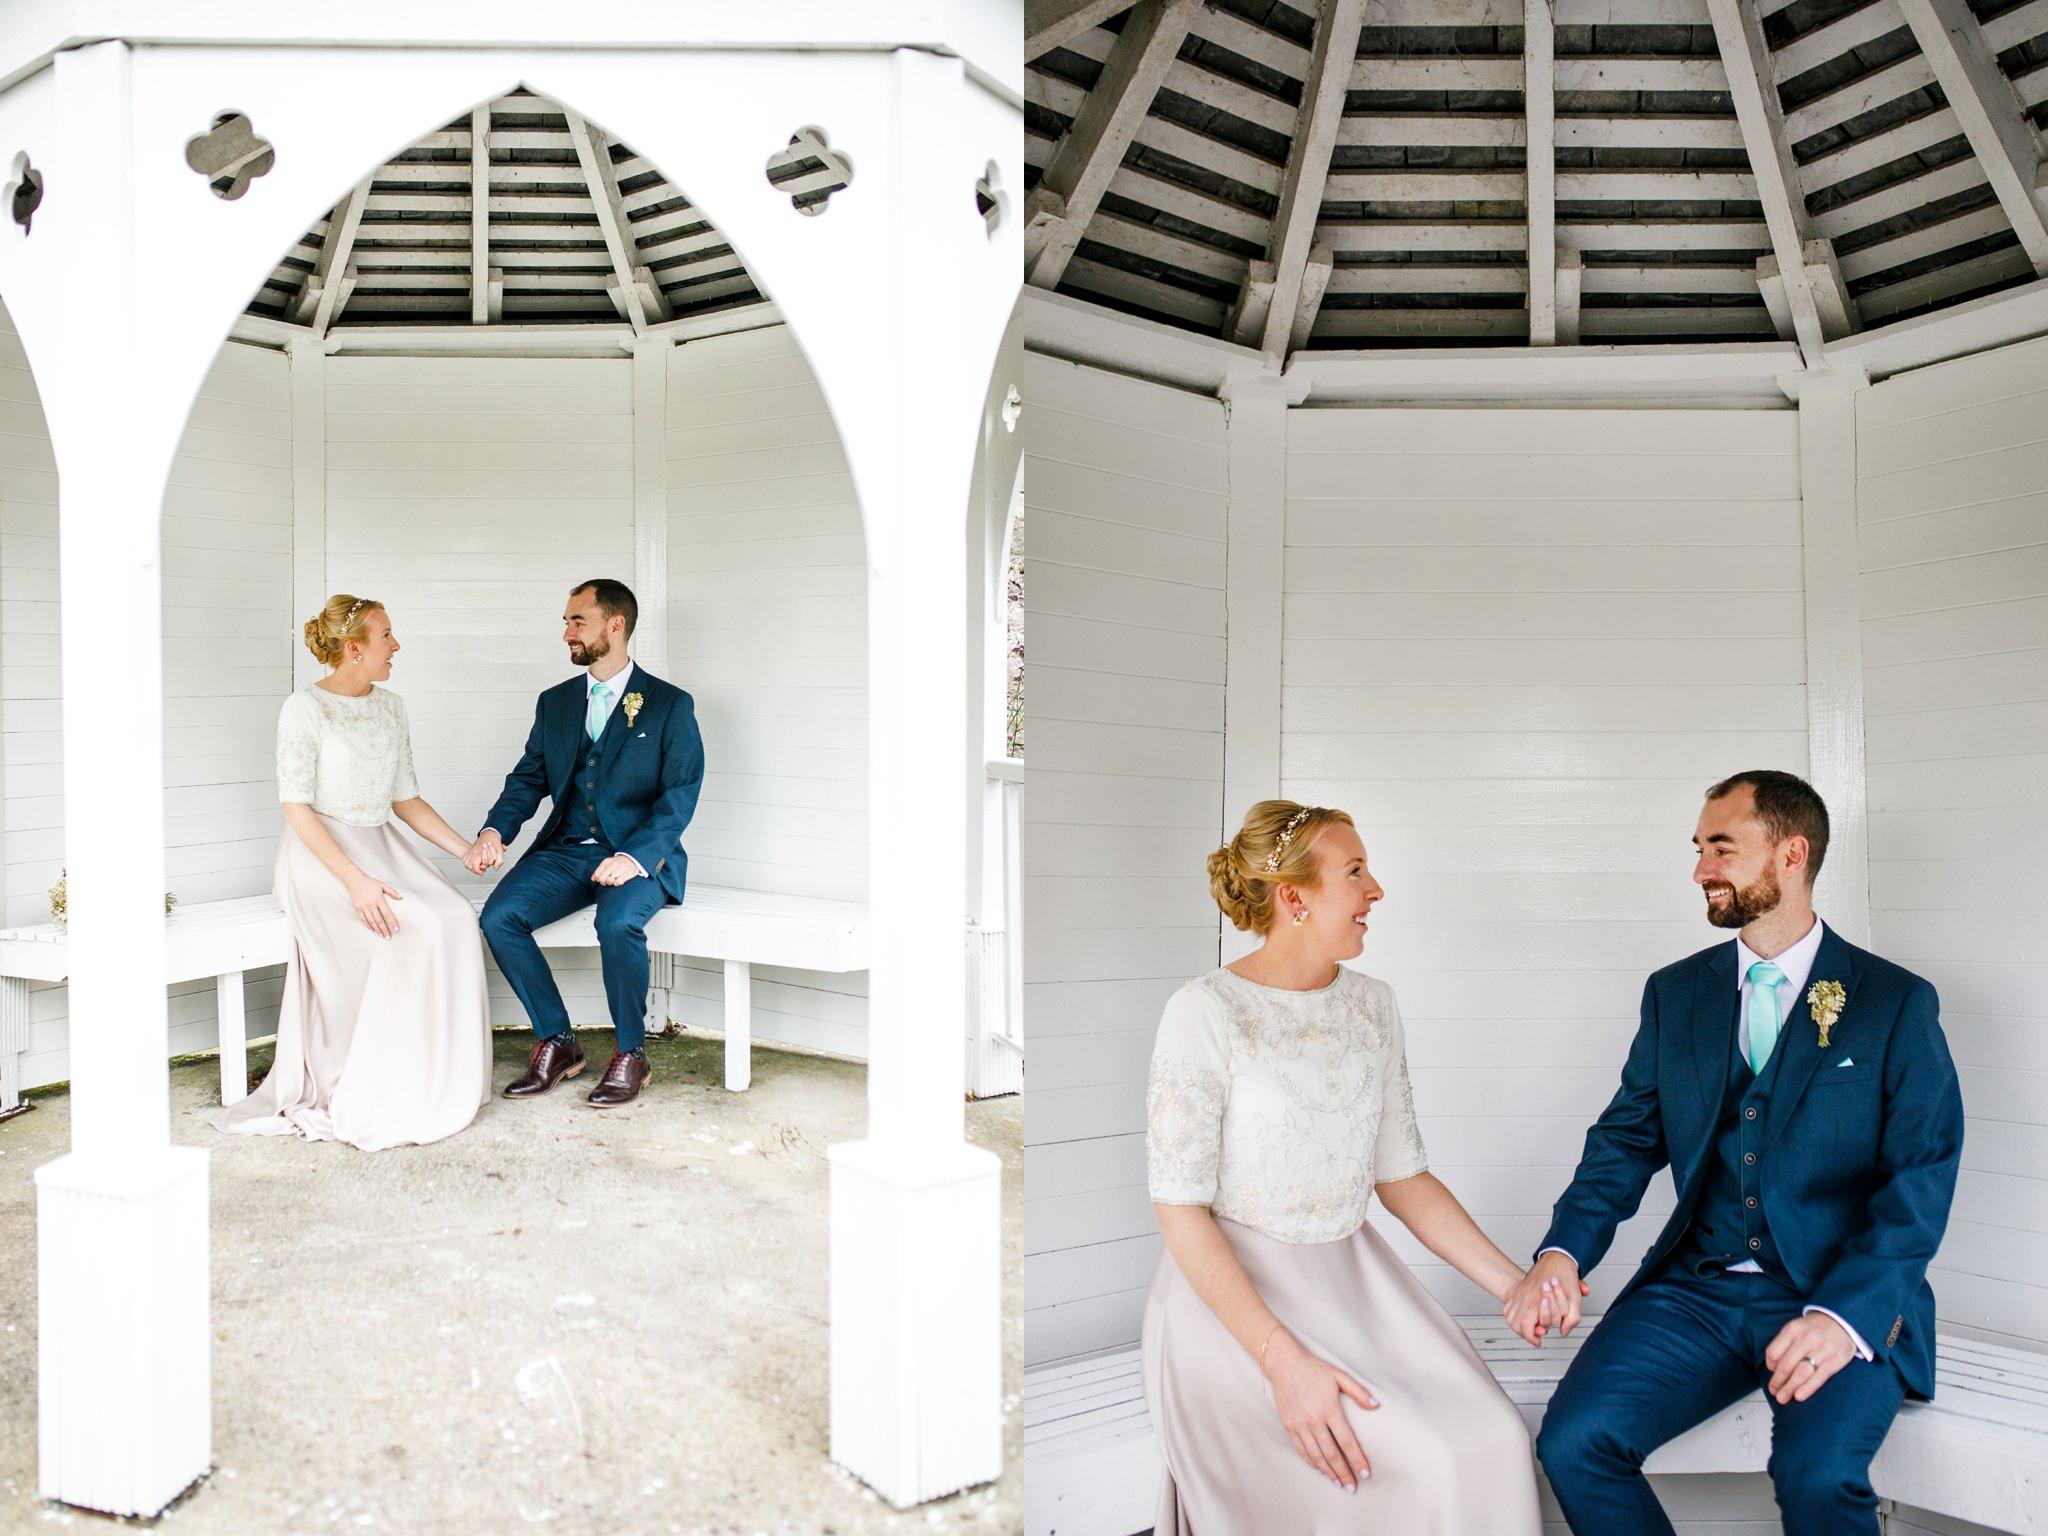 Elisha-Clarke-Photography-Dublin-City-Wedding_0092.jpg